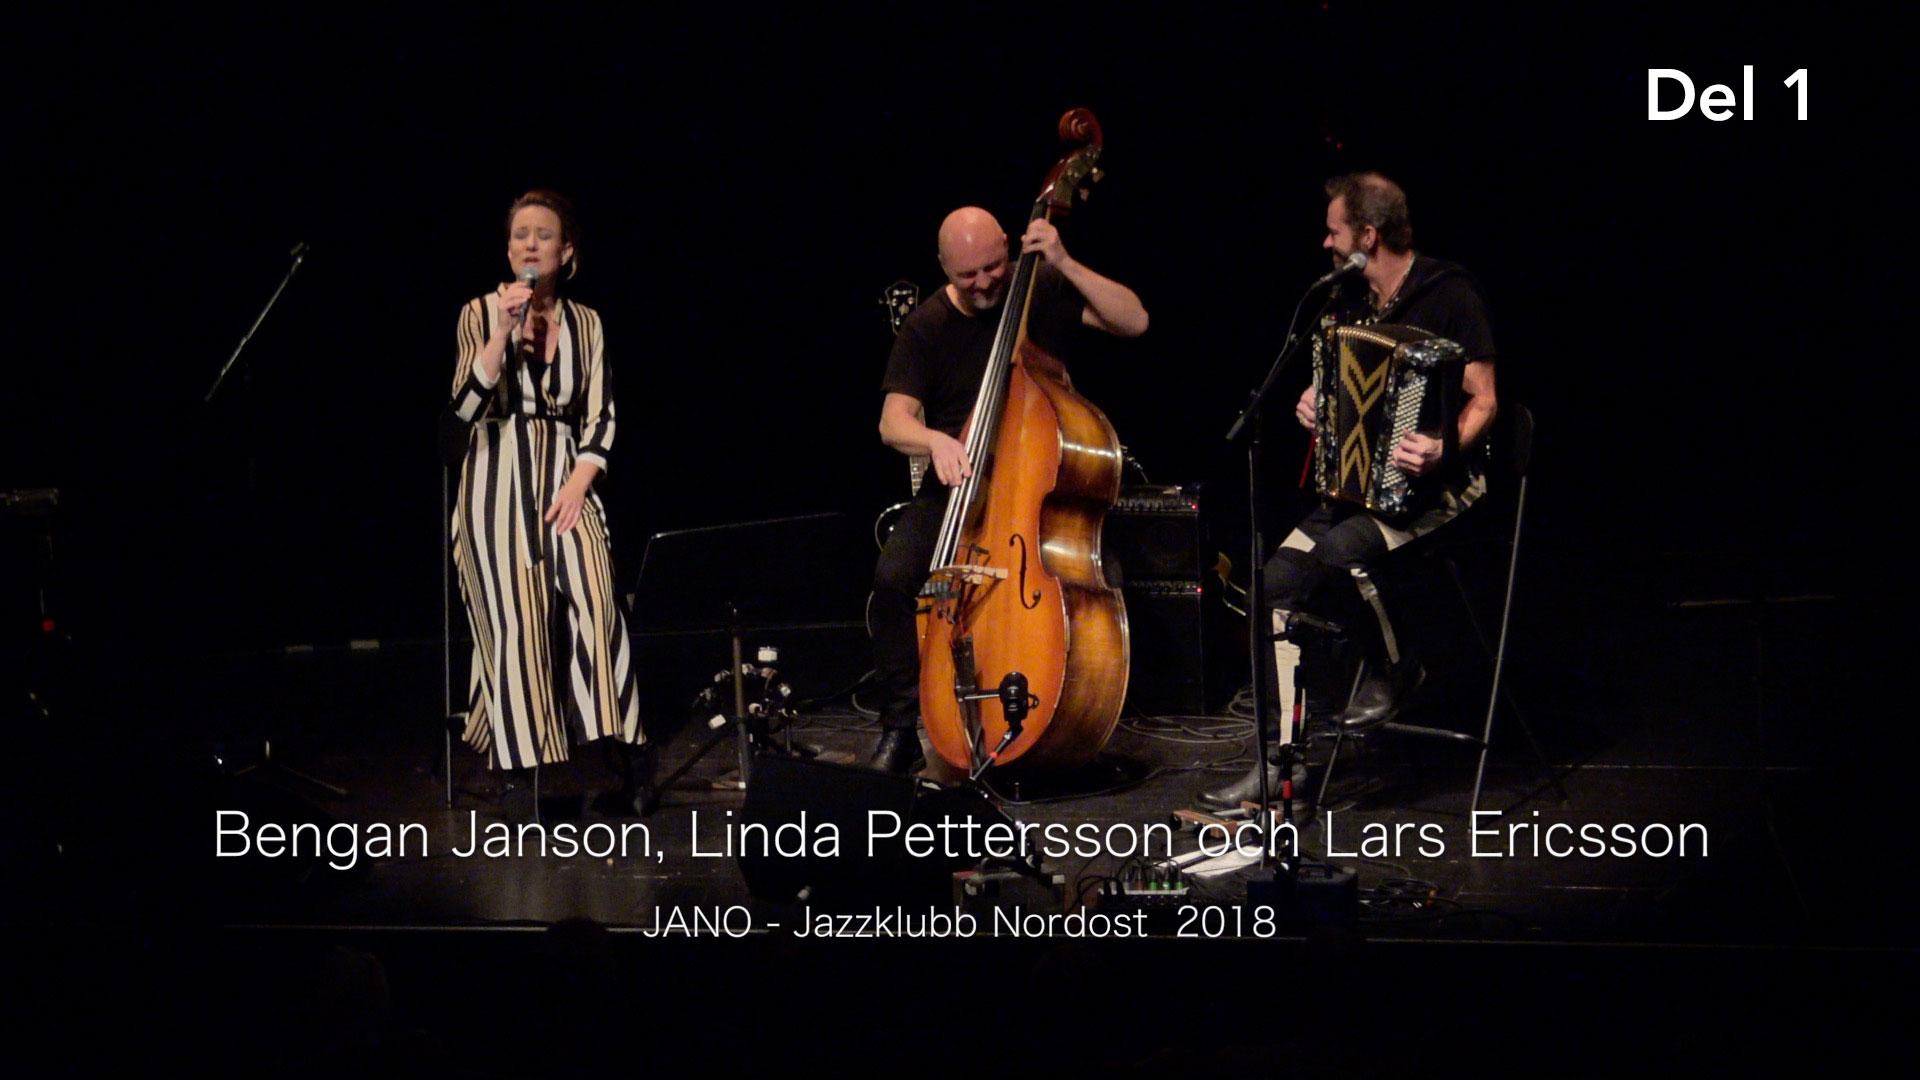 Bengan Jansson Linda Pettersson Lars Ericsson